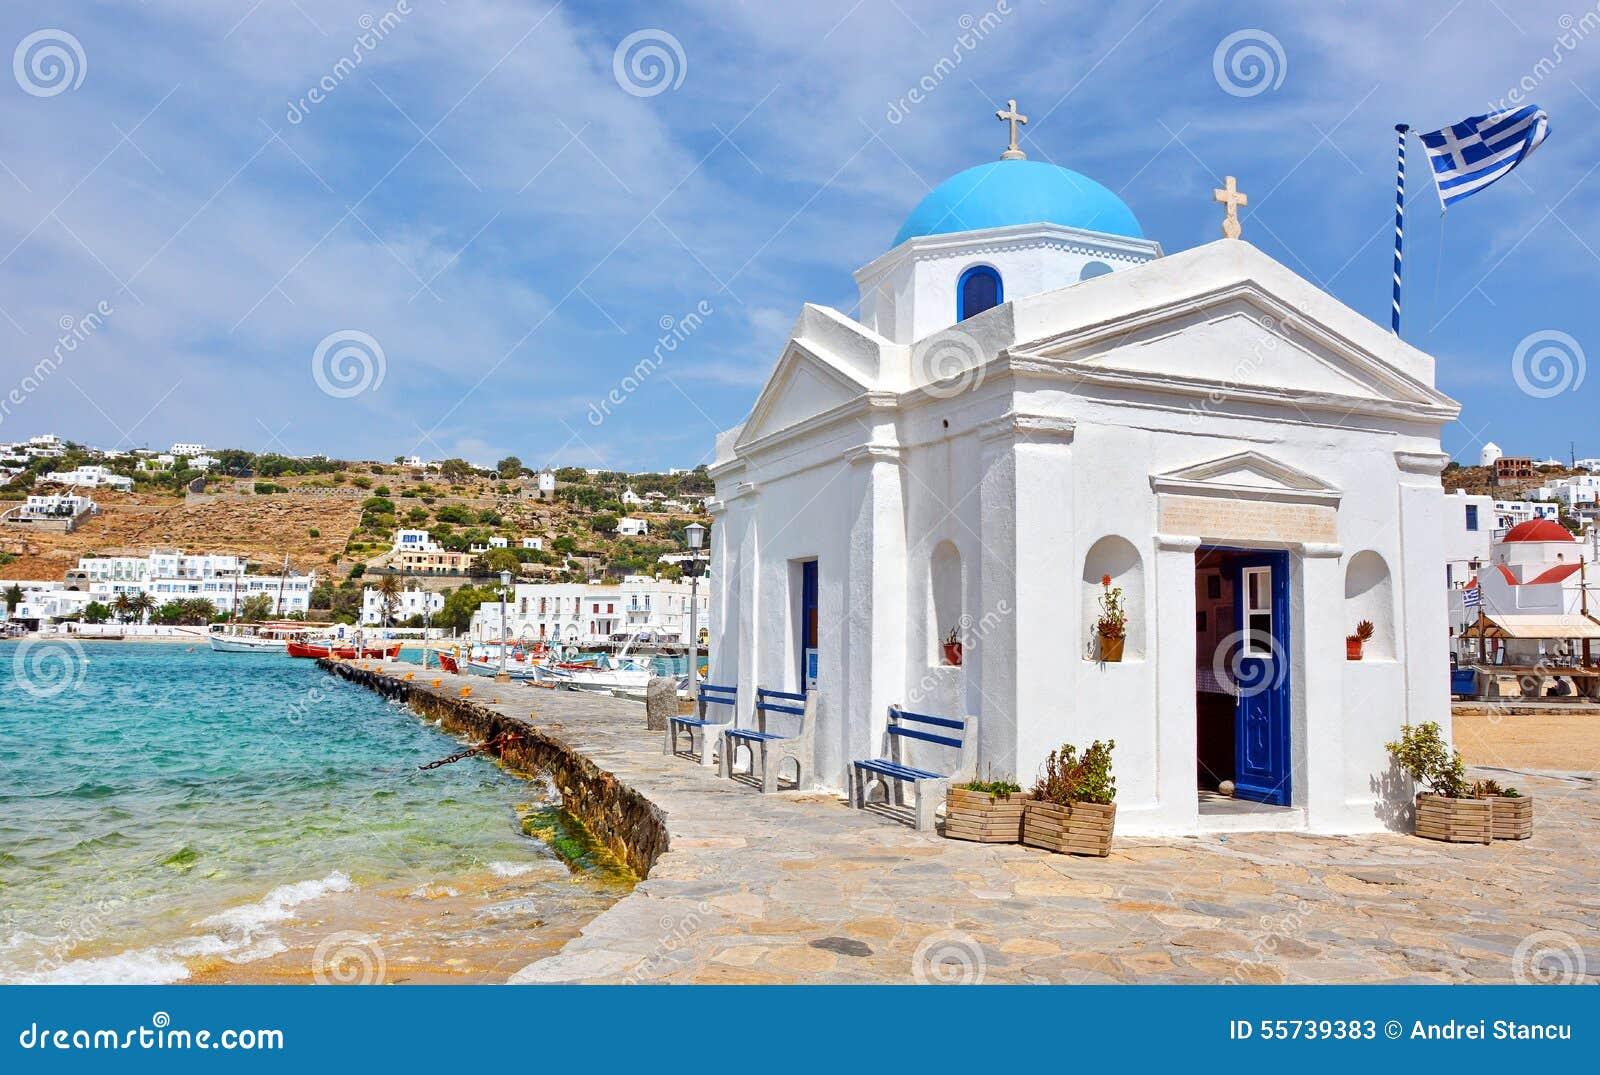 Greek Islands Cafe Prices